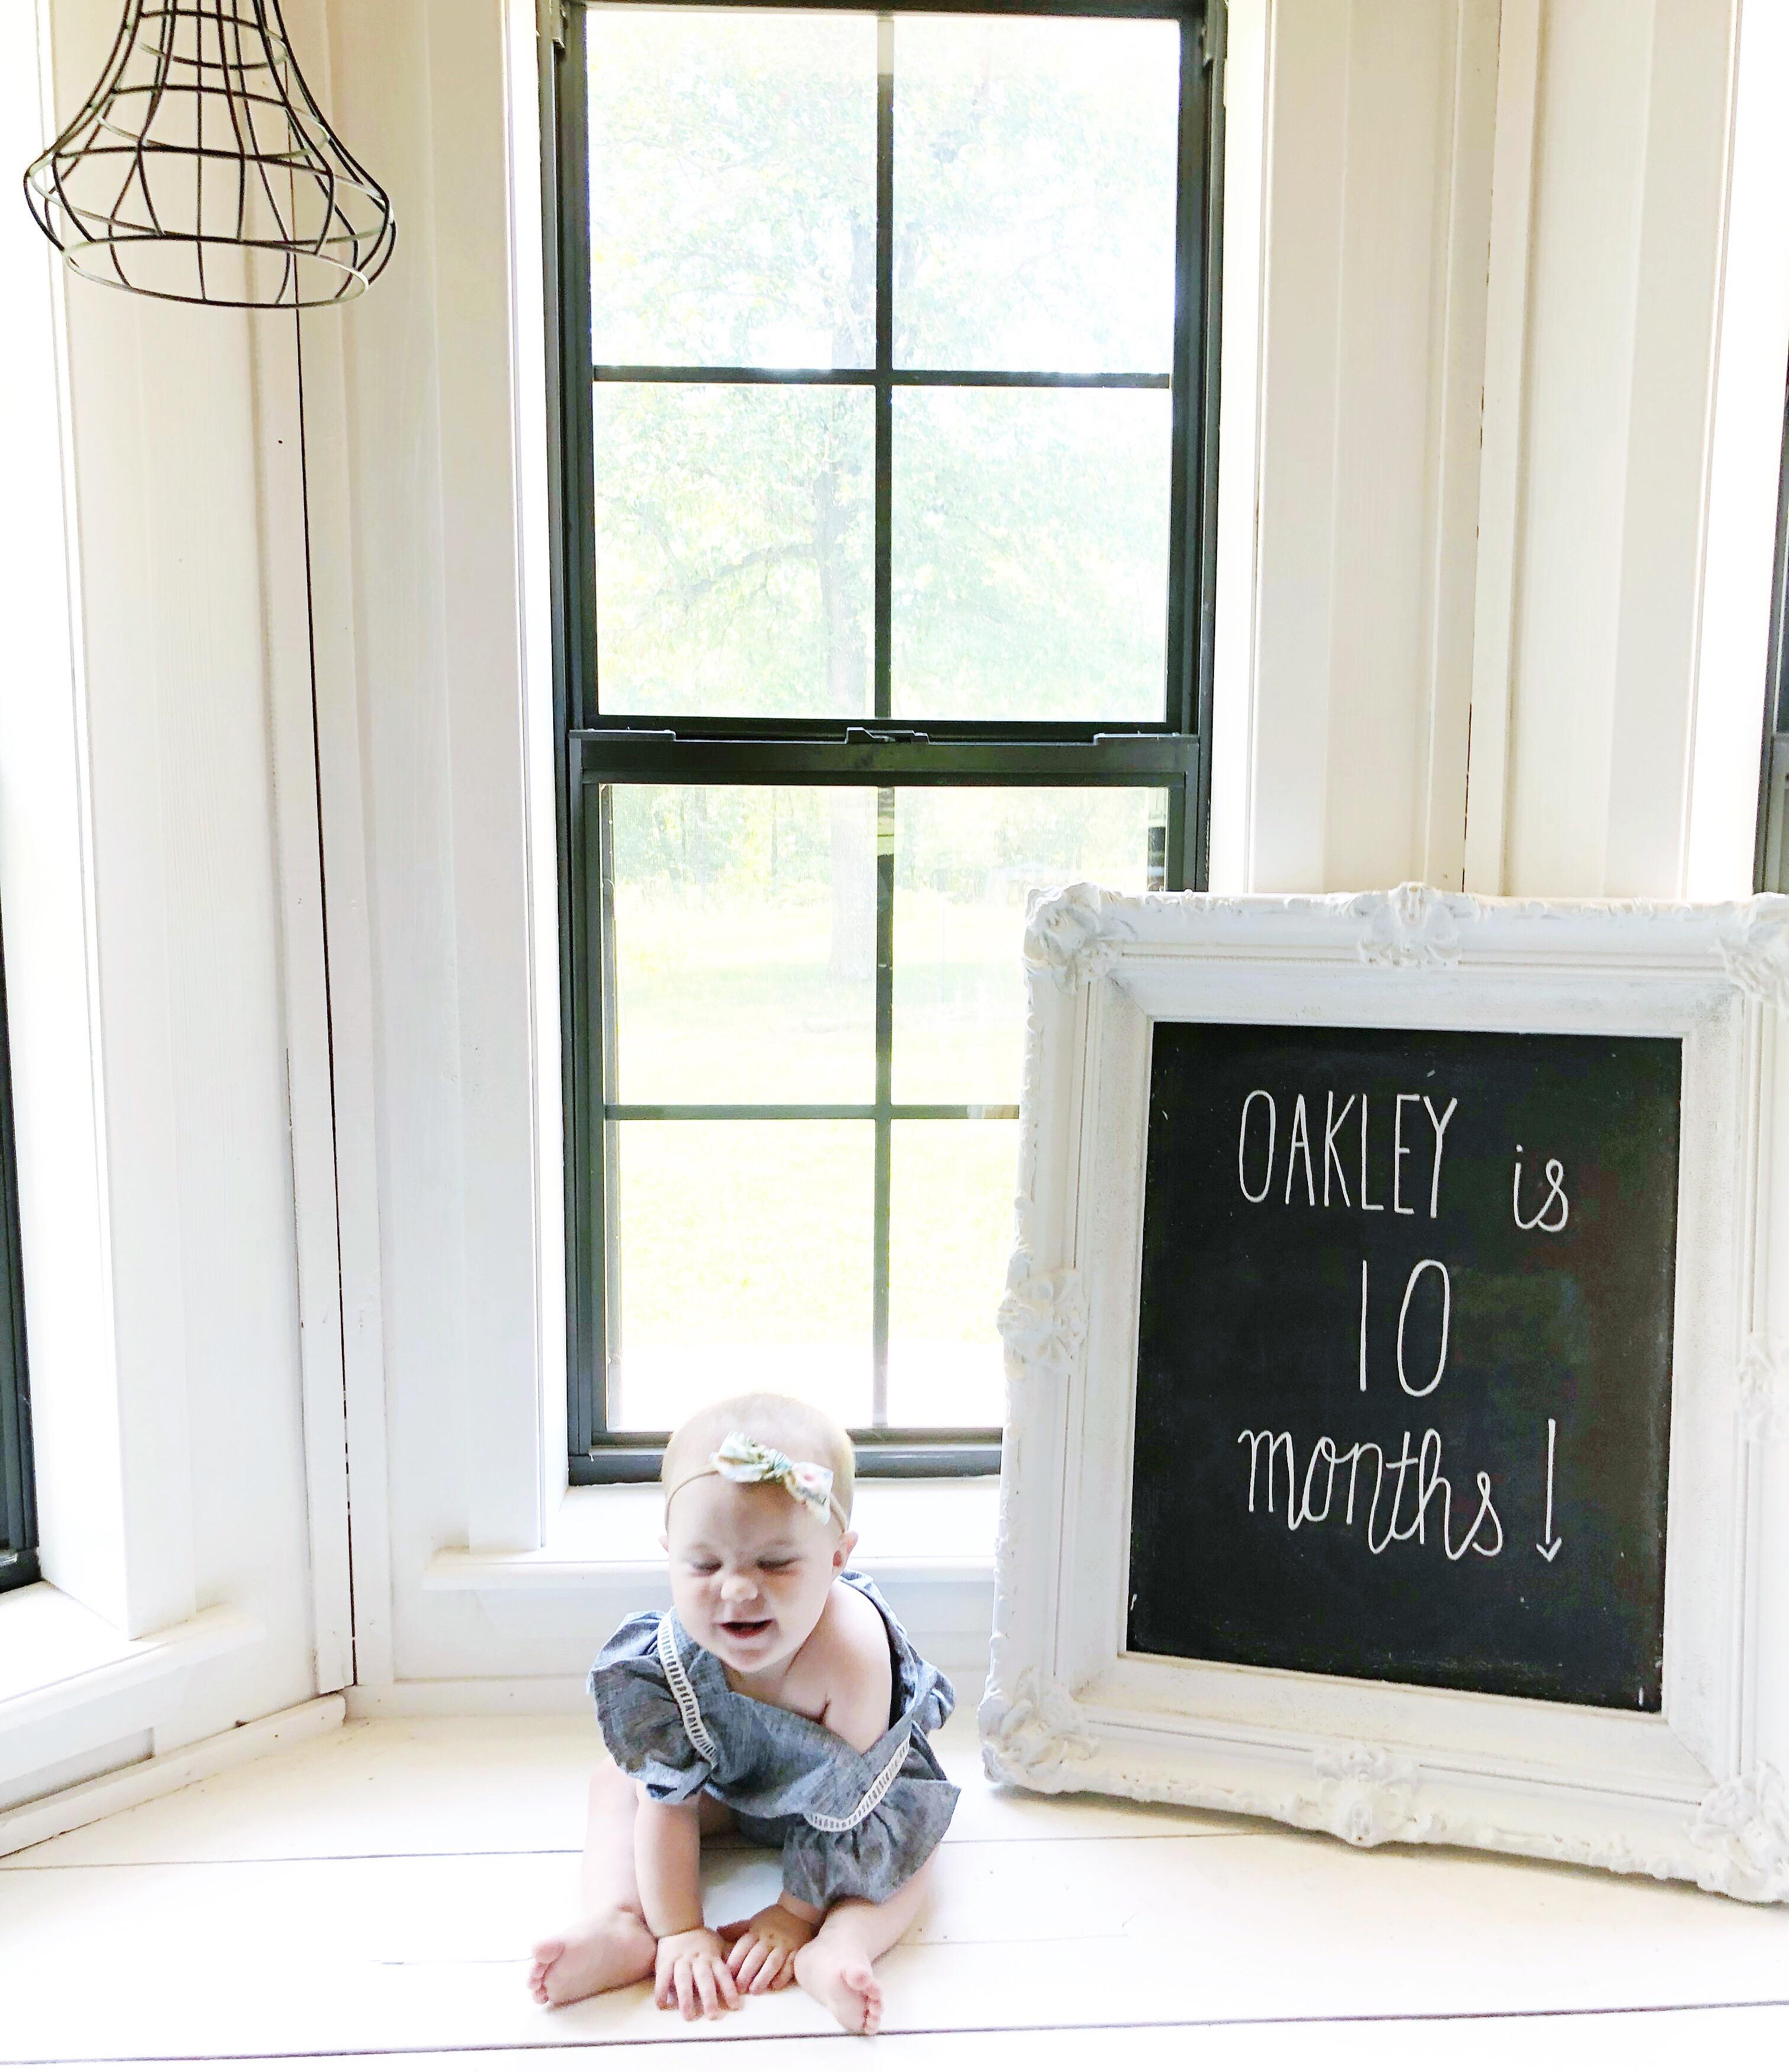 Oakley is 10 months old!